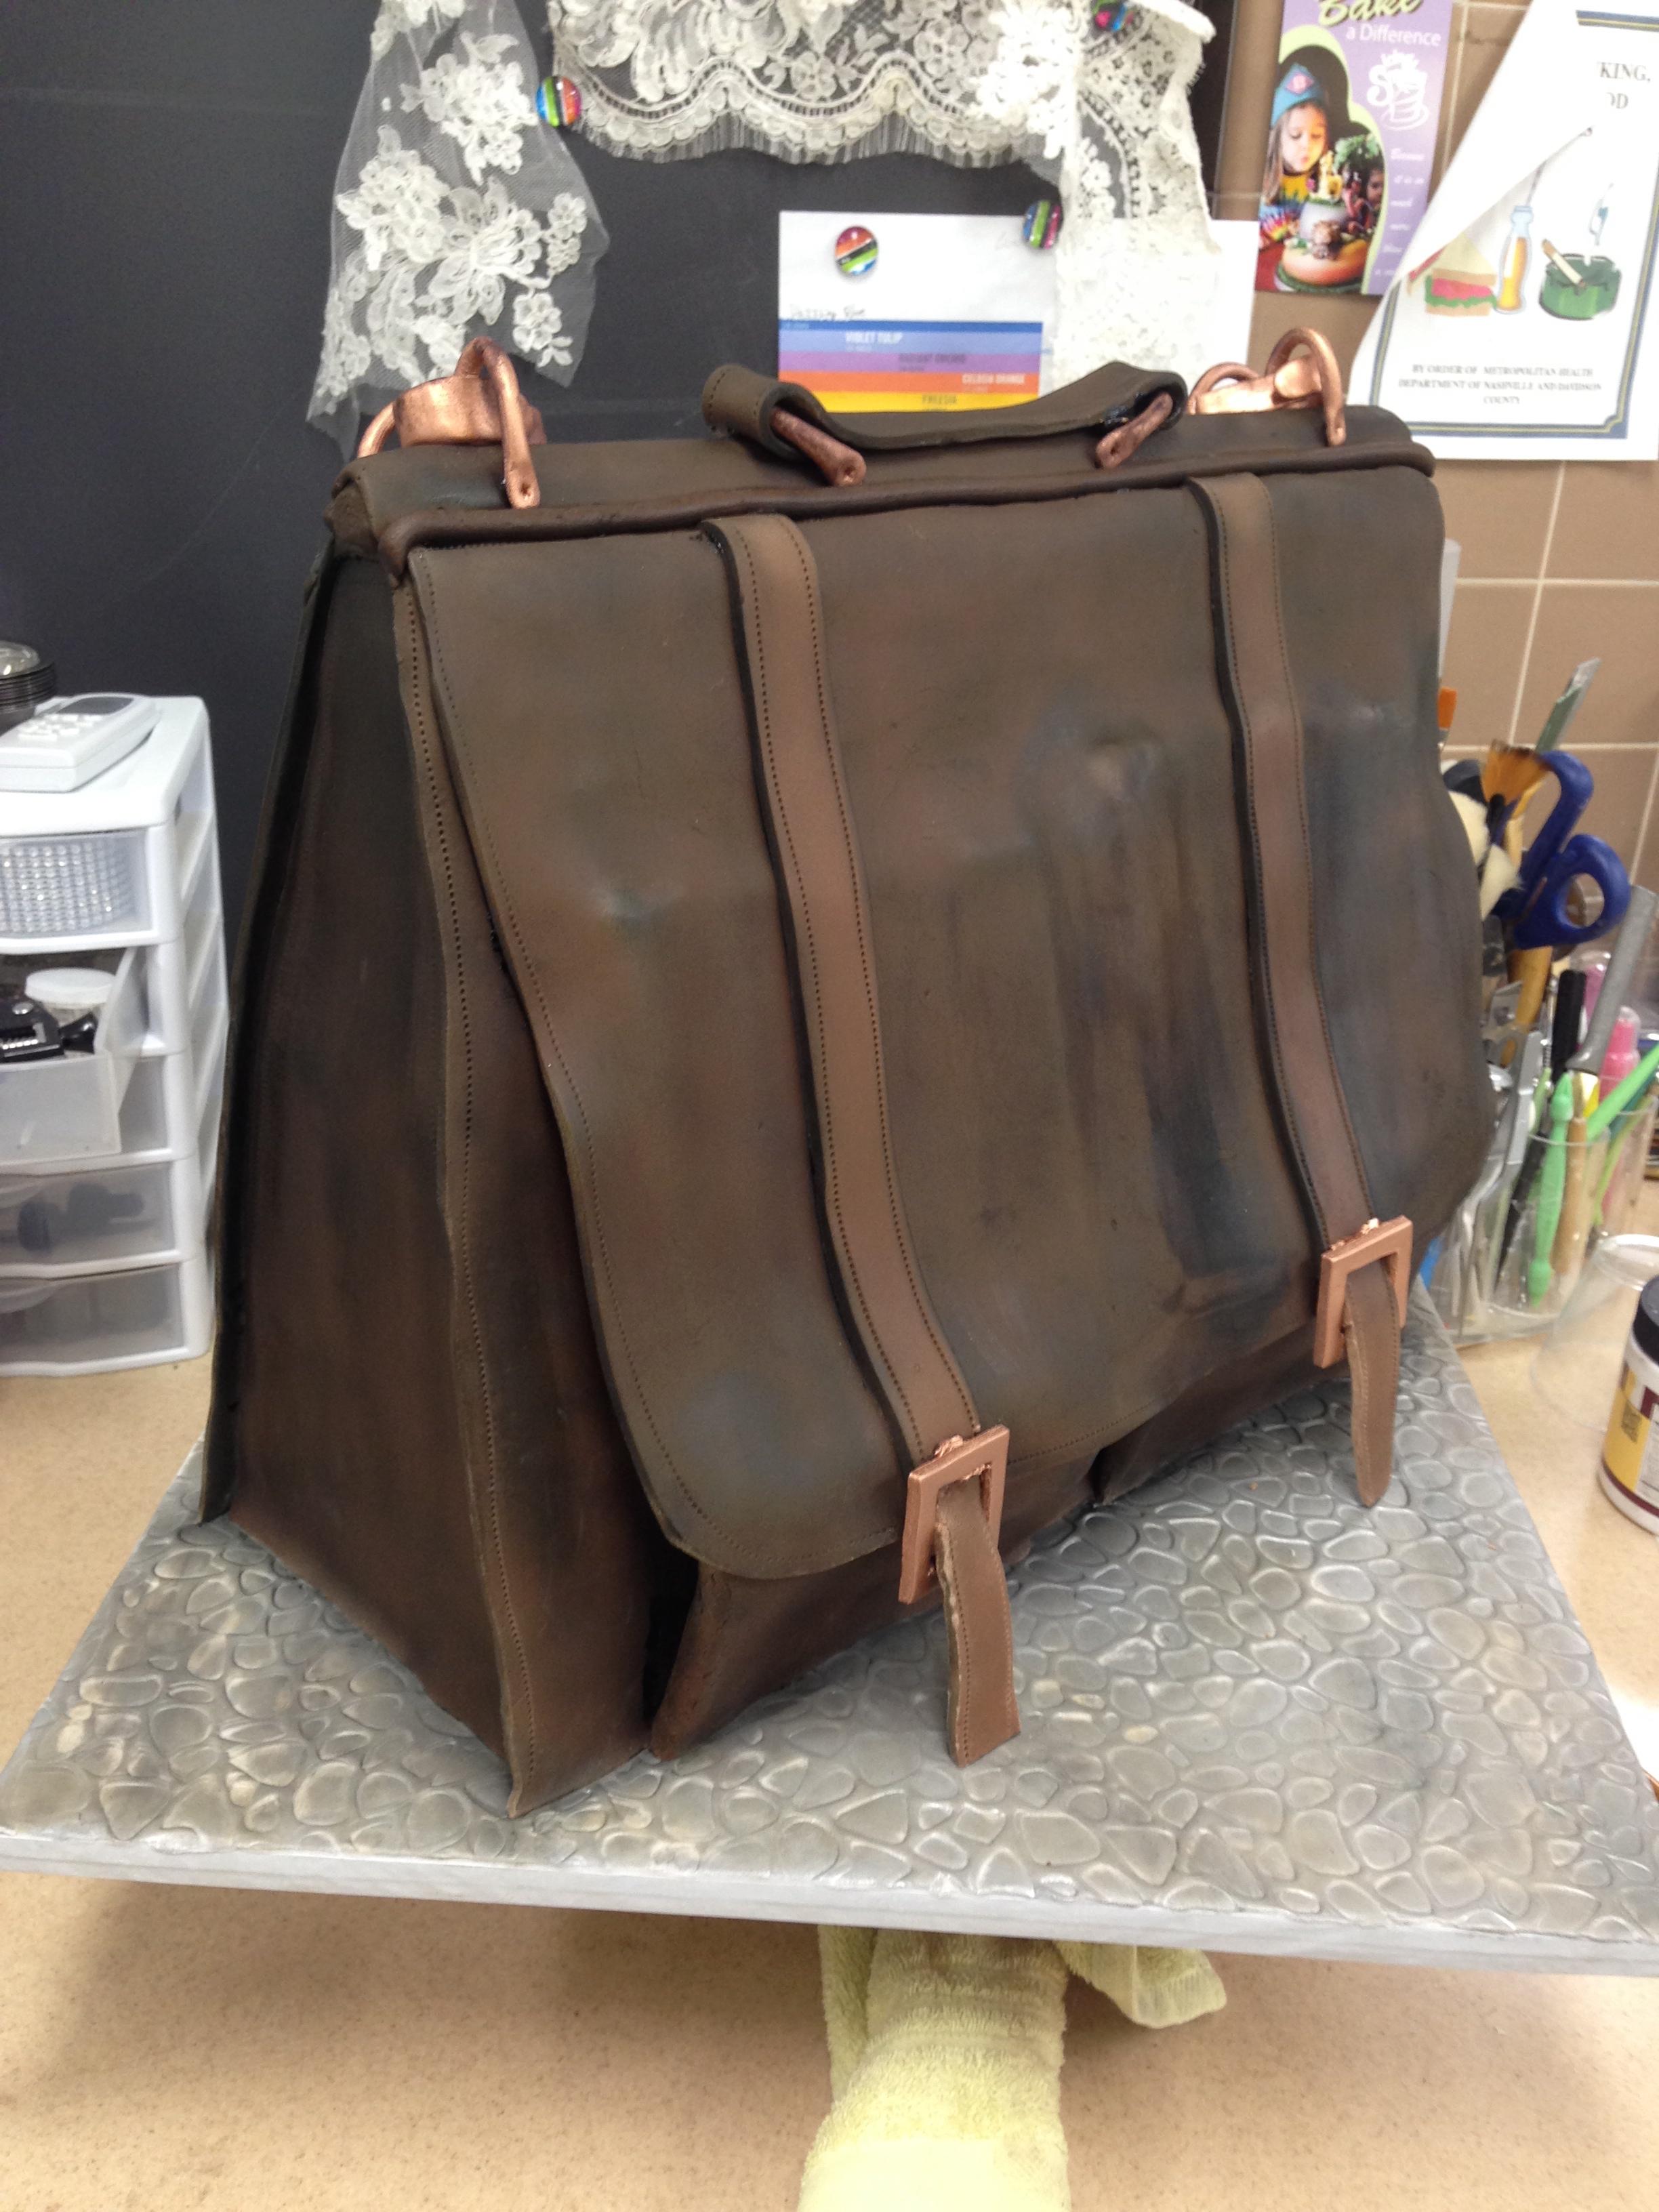 Grooms Cake / Birthday cake